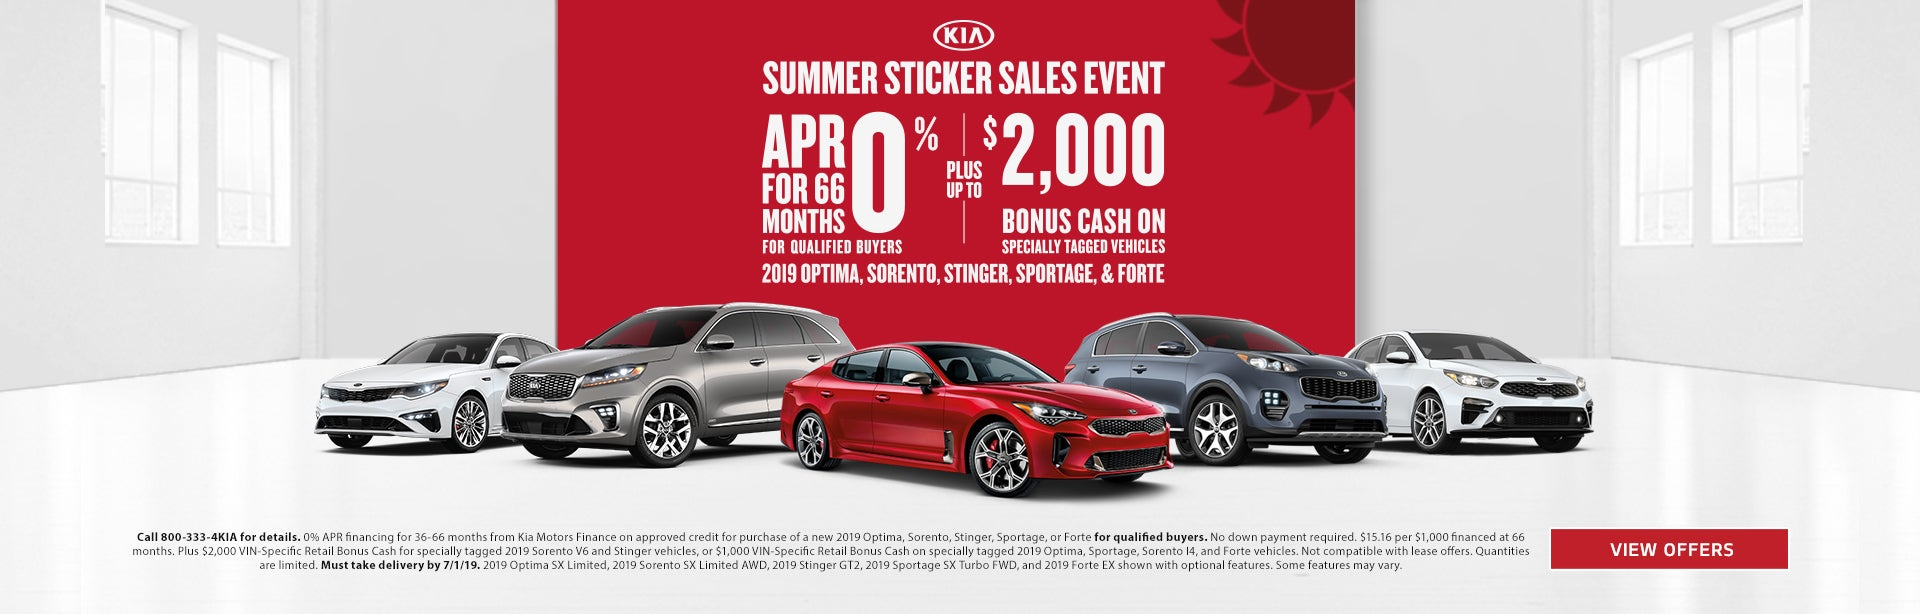 Russ Darrow Kia Madison >> Kia Dealer in Madison, WI   New and Used Cars Madison ...